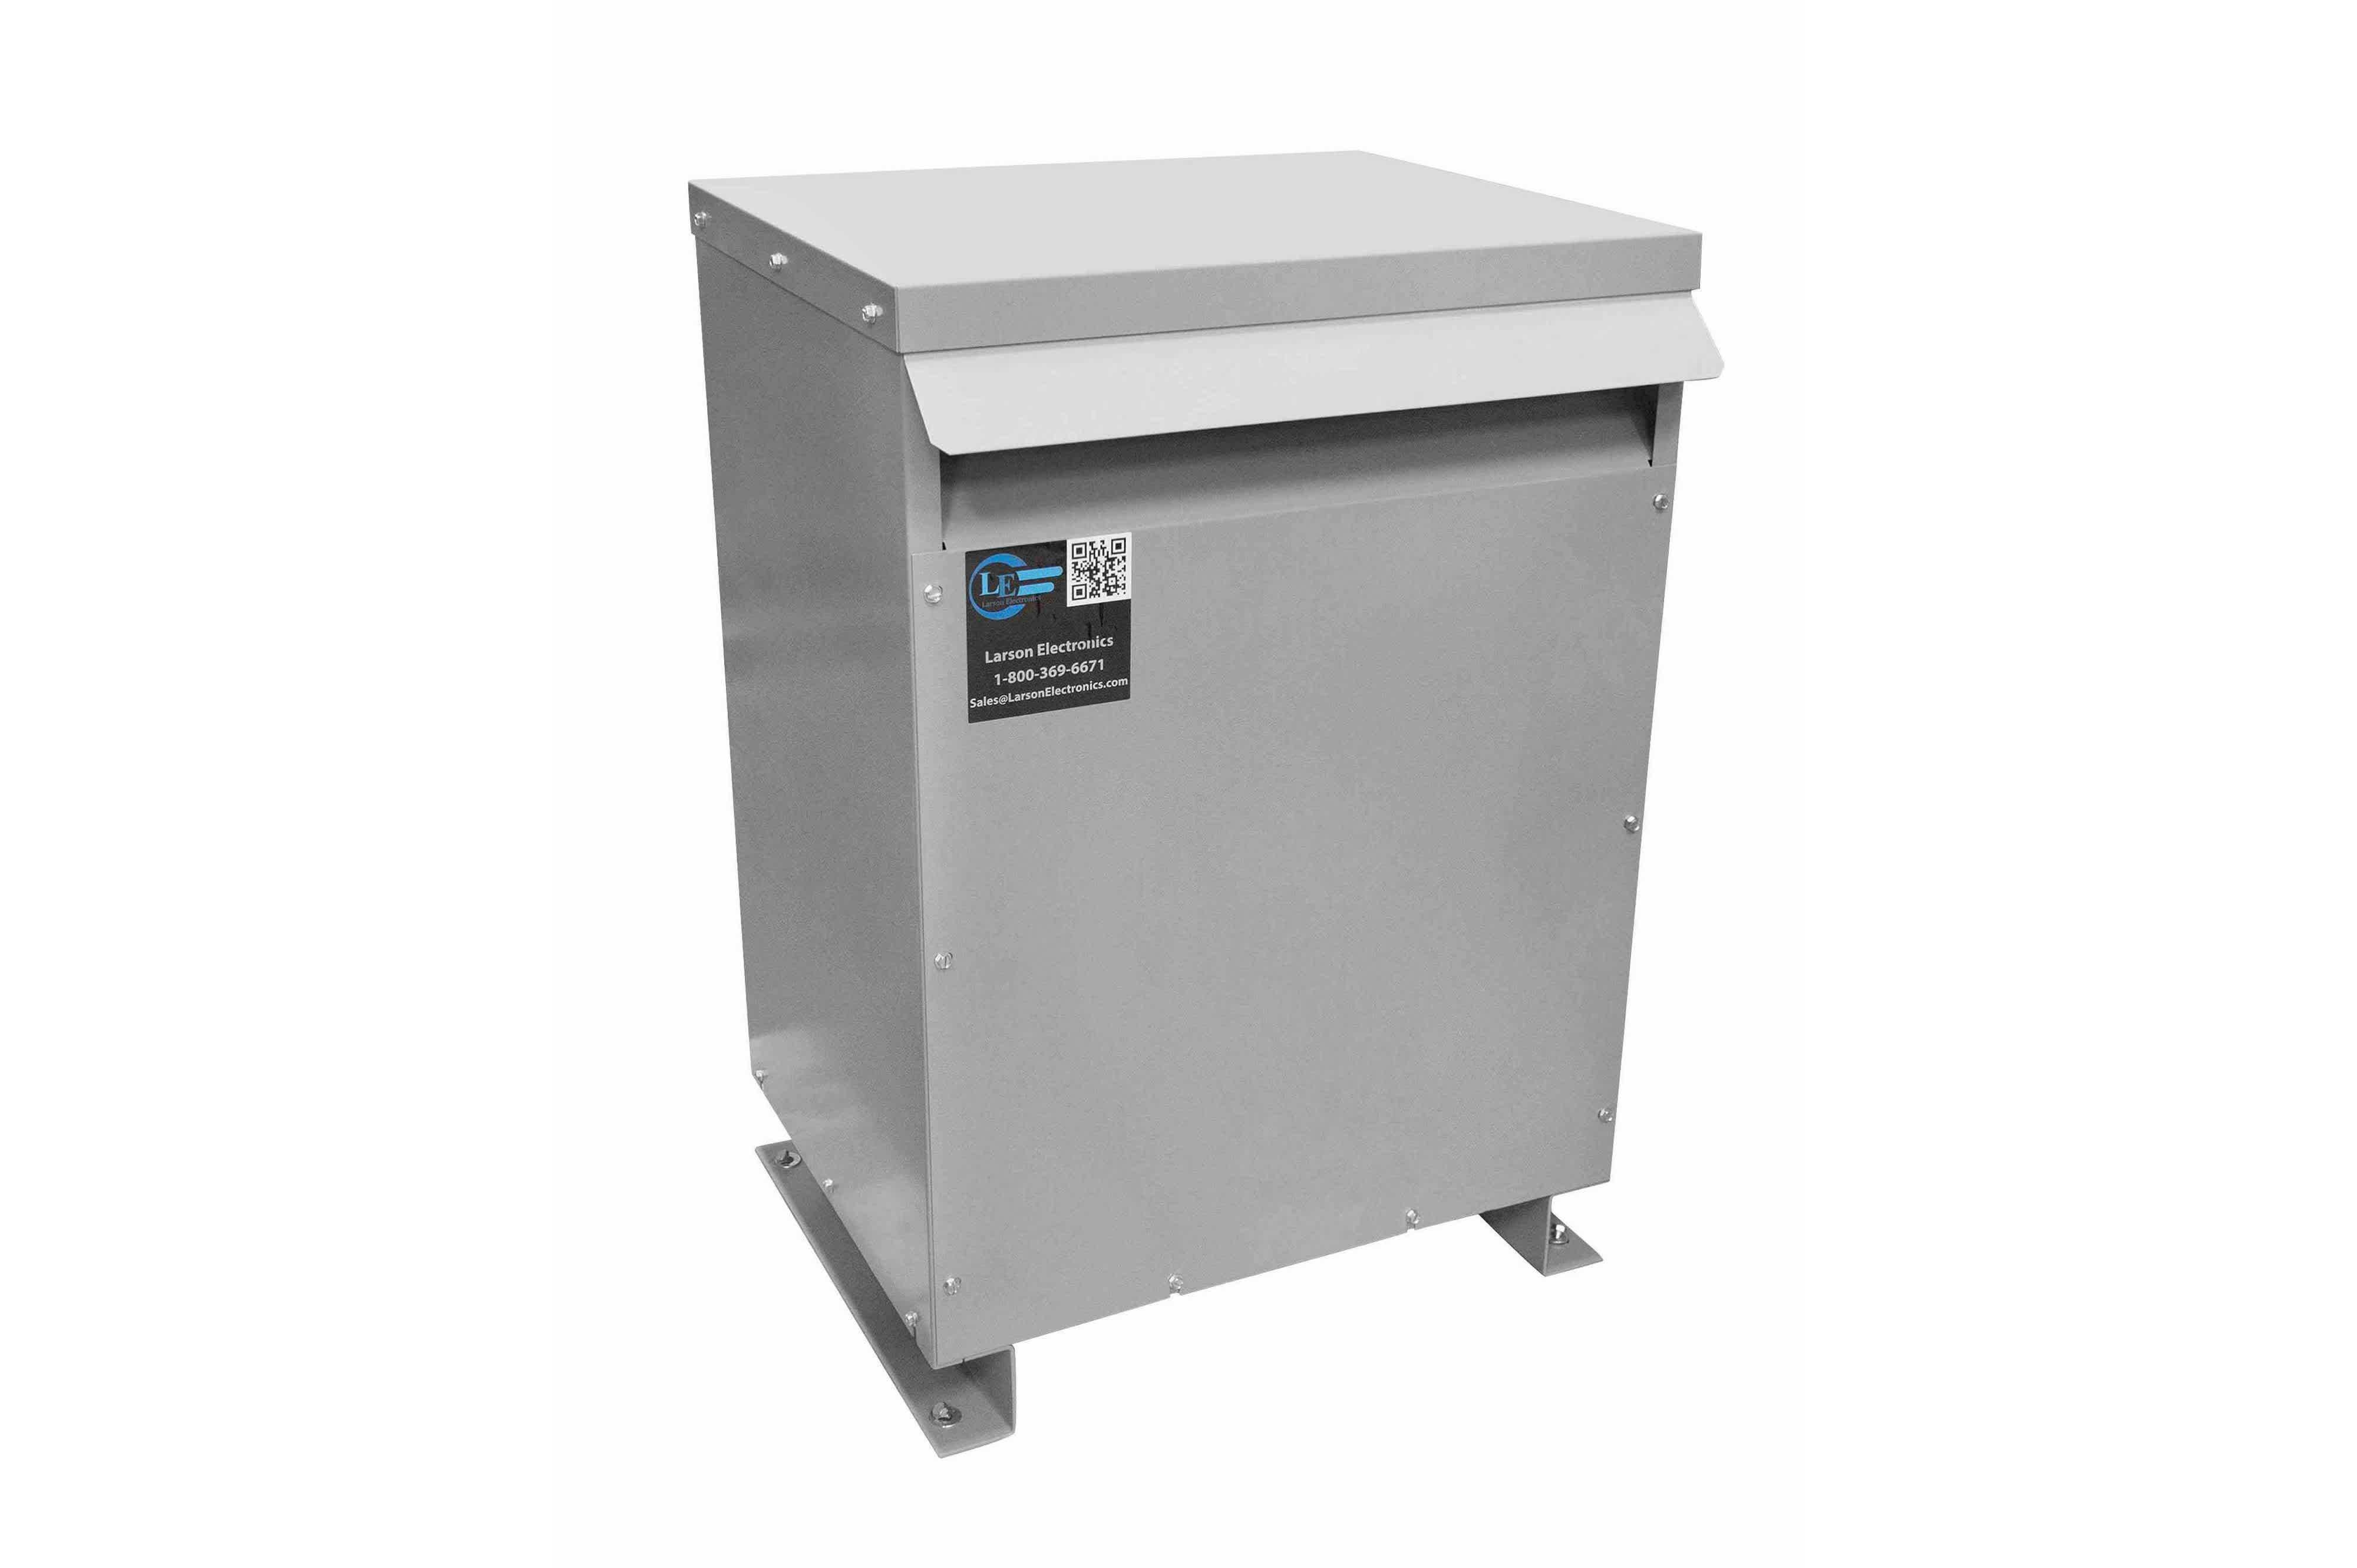 20 kVA 3PH Isolation Transformer, 440V Wye Primary, 240V Delta Secondary, N3R, Ventilated, 60 Hz